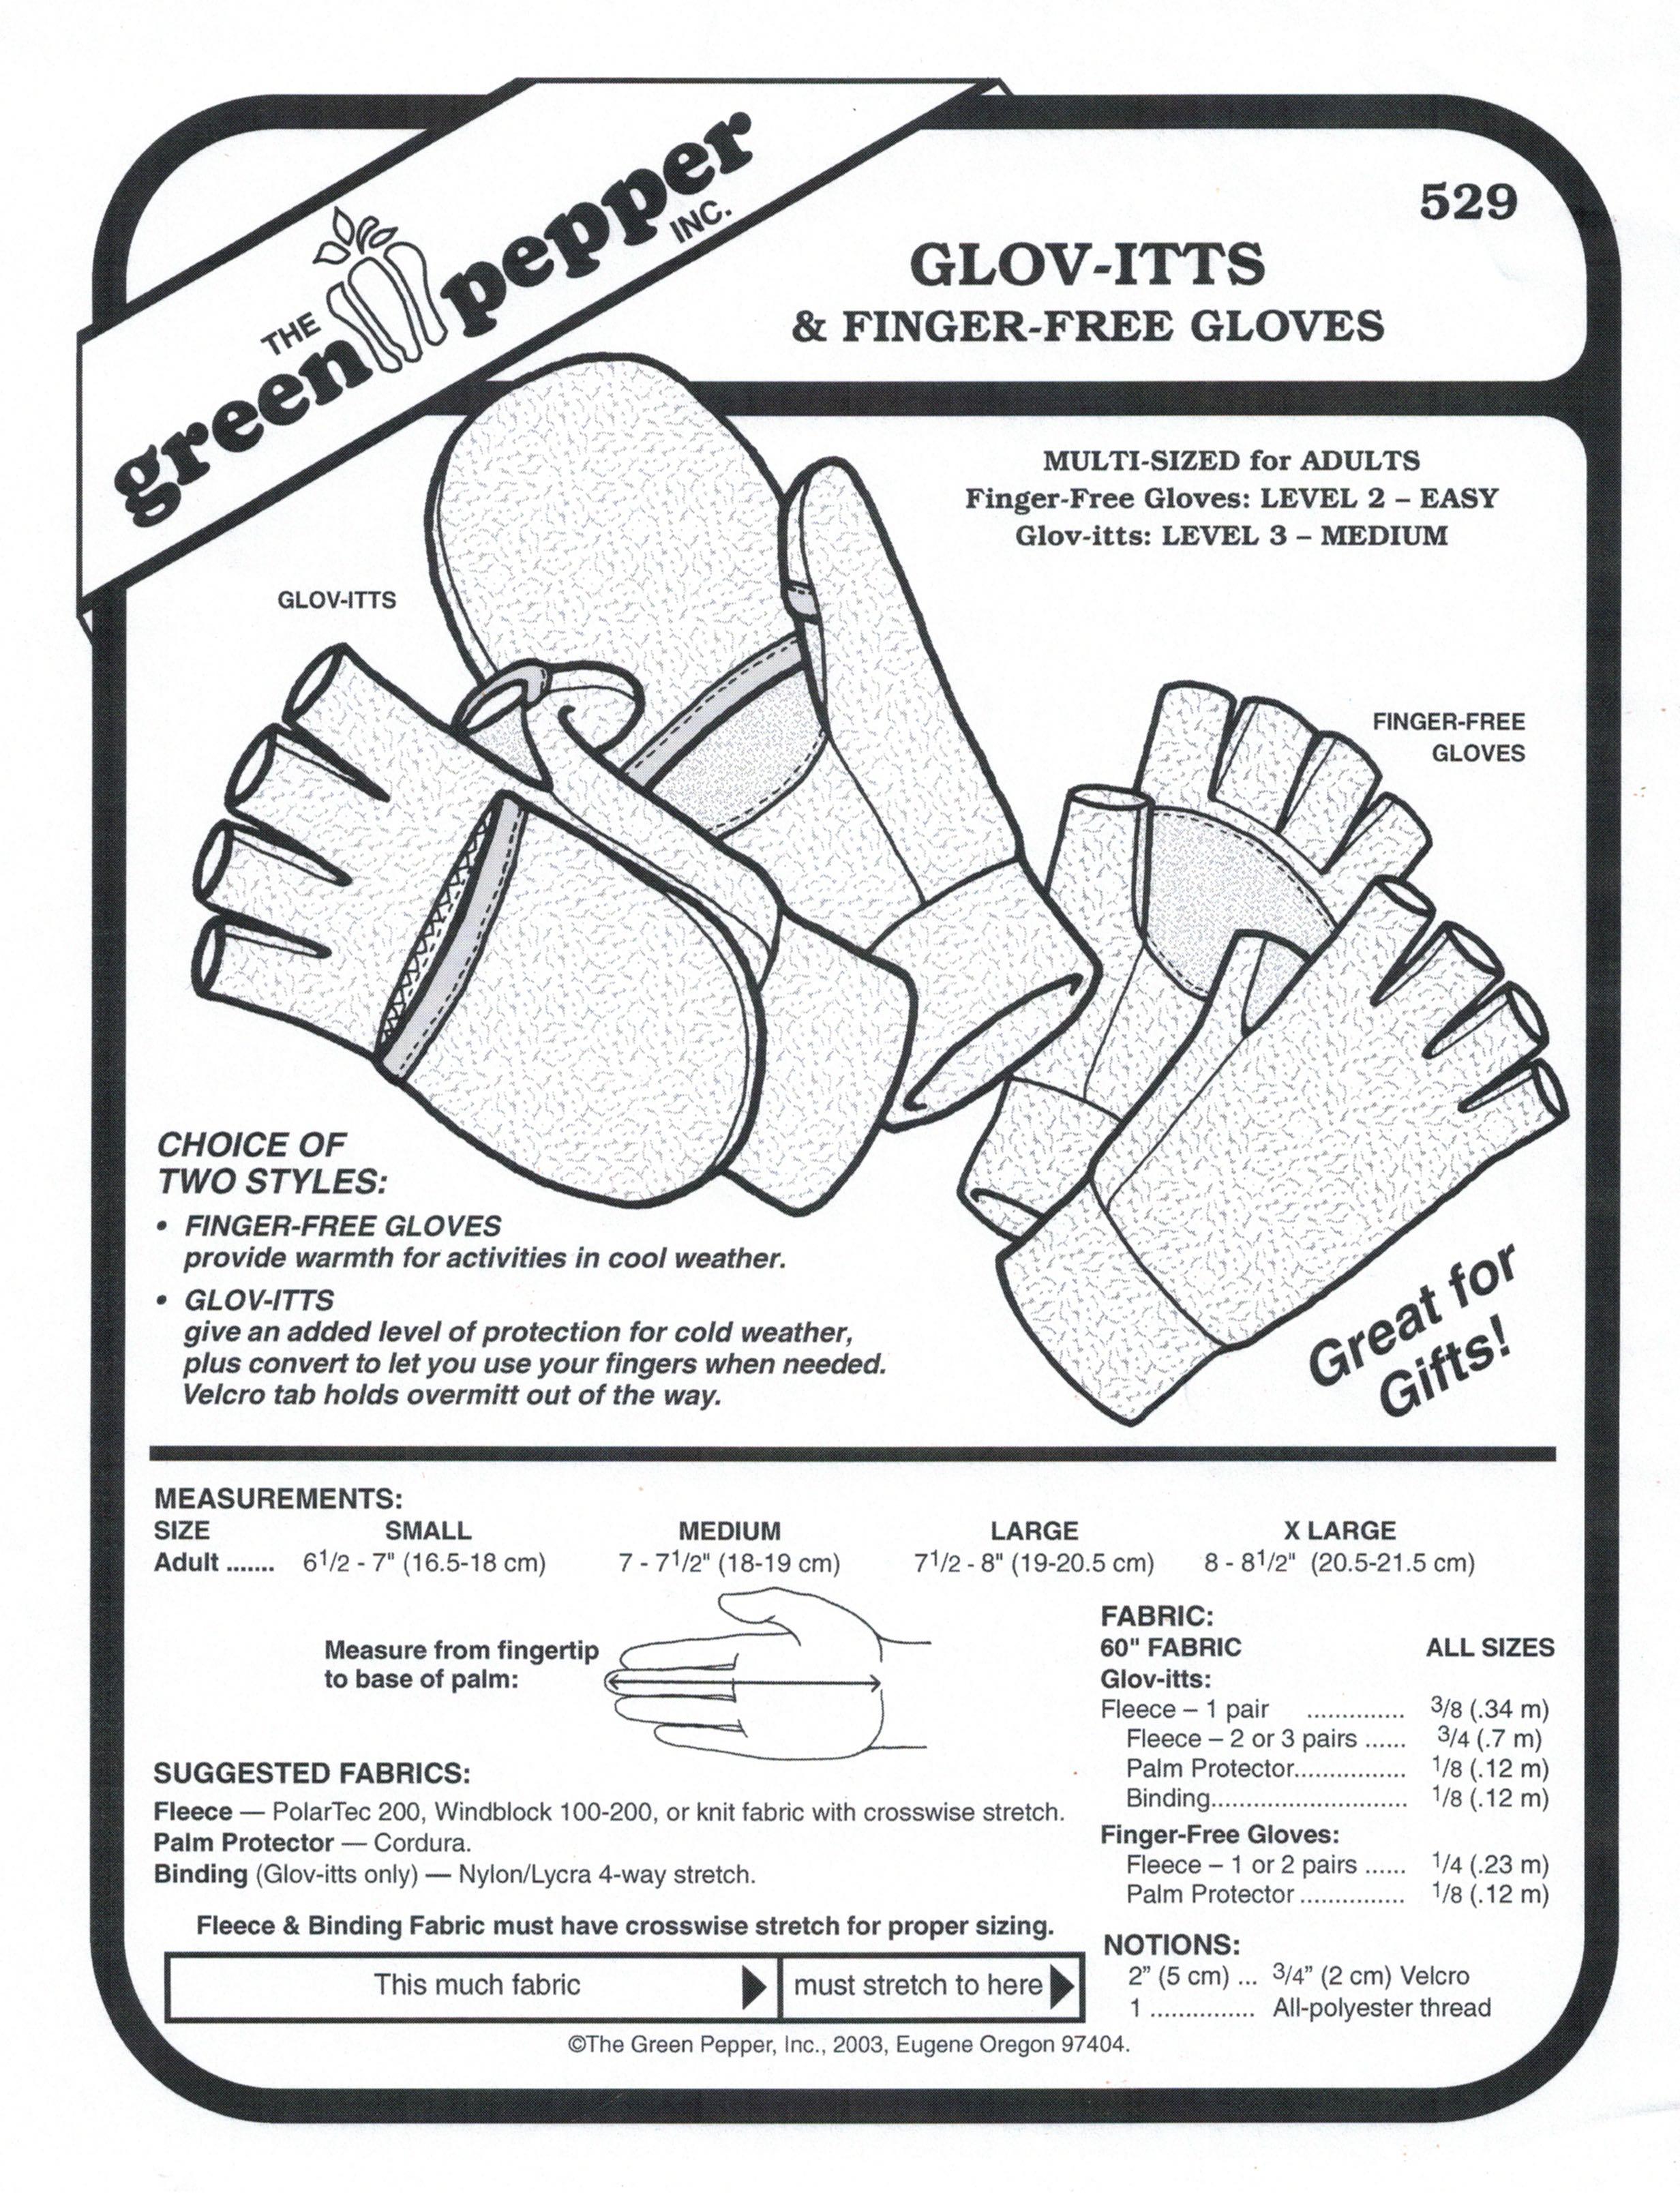 Glov-Itts & Finger-Free Gloves Sewing Pattern